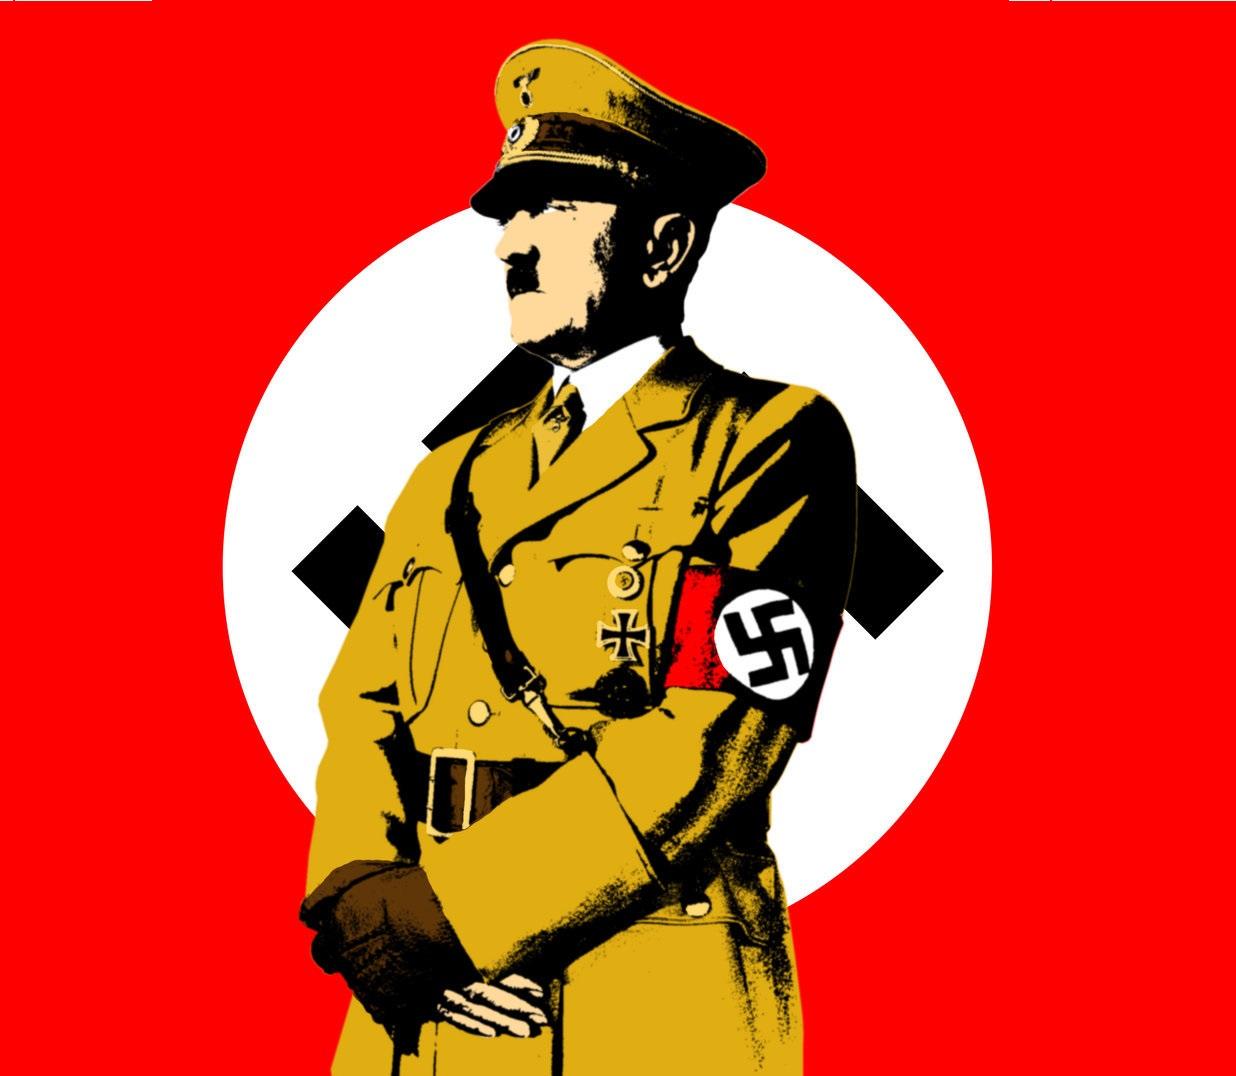 Hitler influencer